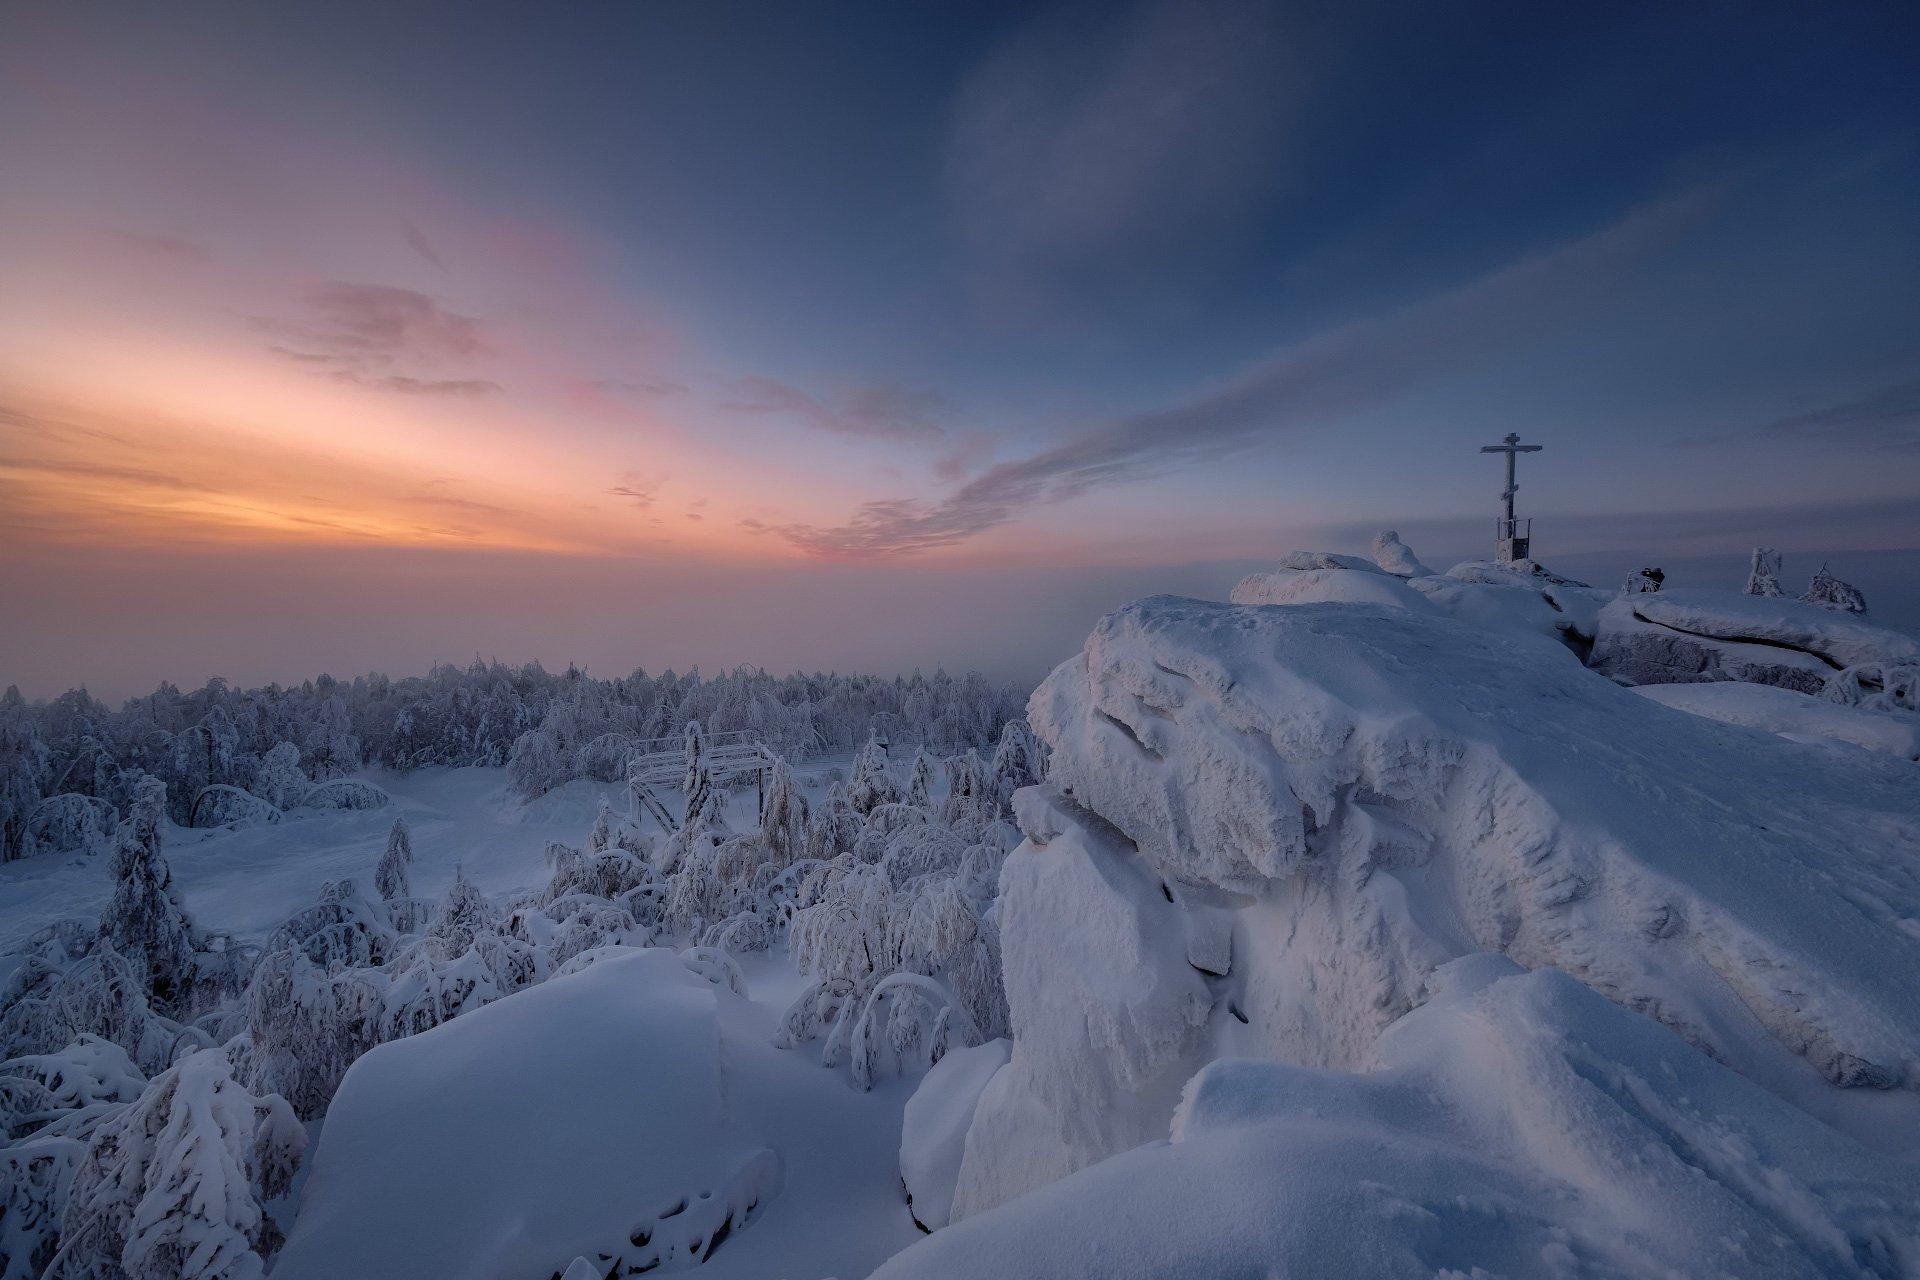 гора, крестовая, закат, губаха, пермь, зима, январь, холод, снег, мороз, Андрей Чиж